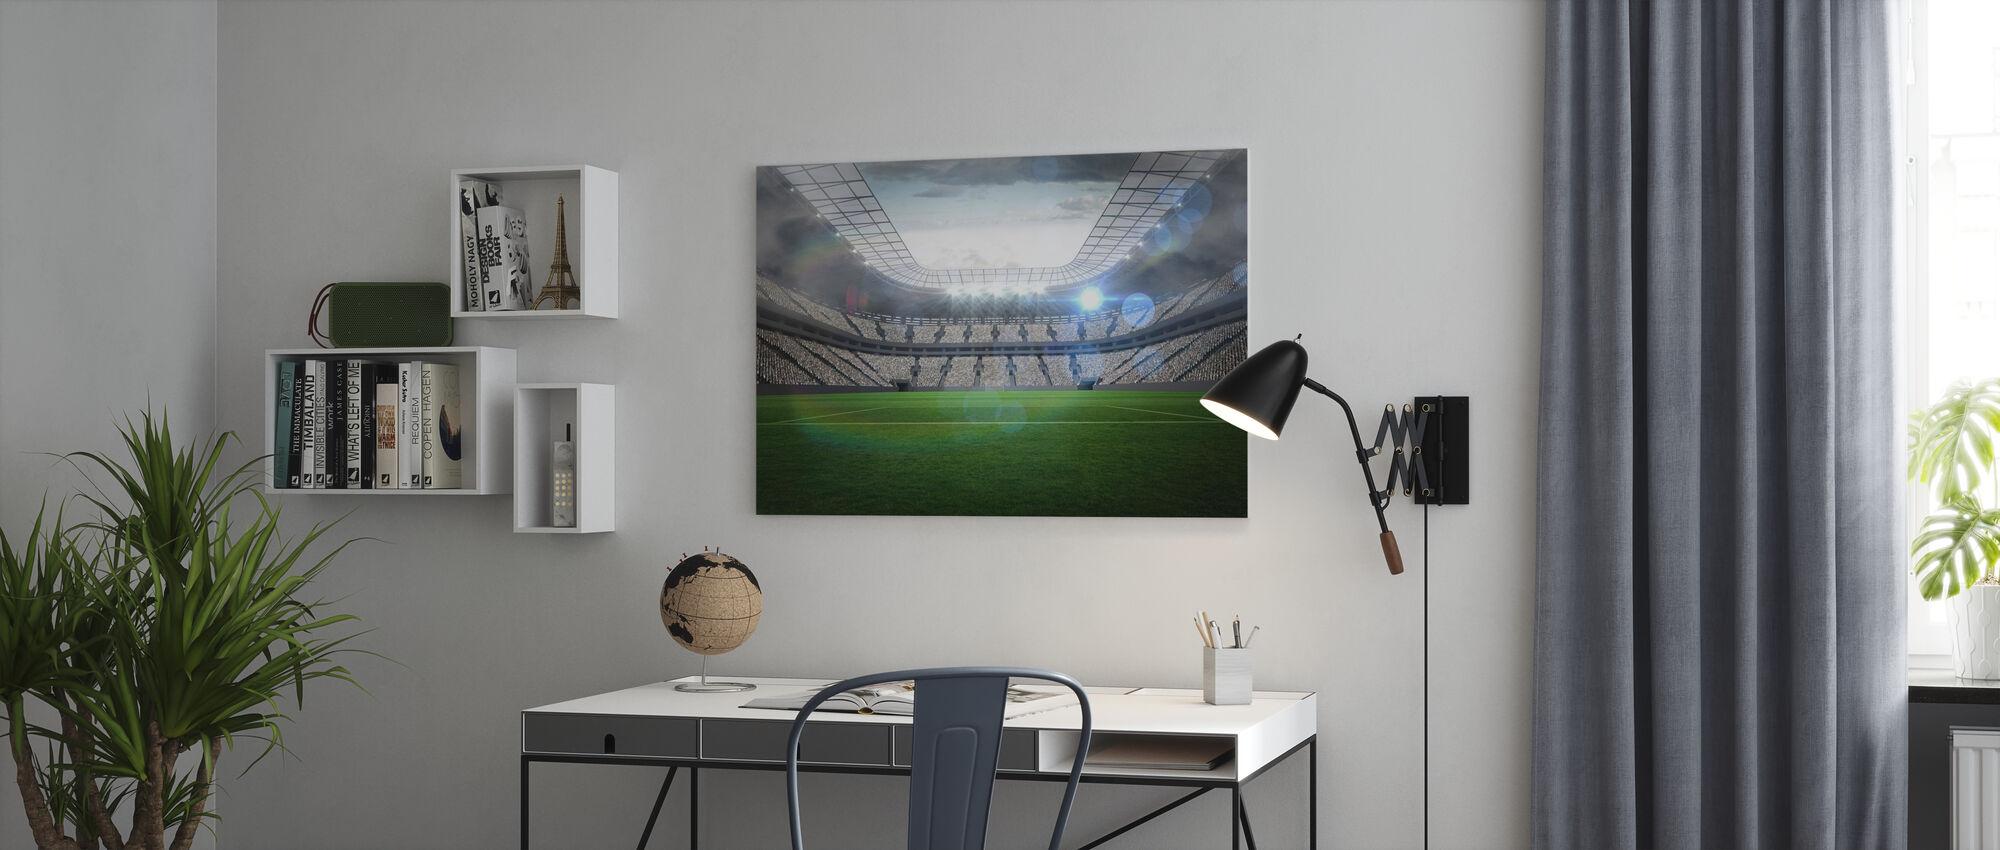 Voetbalstadion - Canvas print - Kantoor